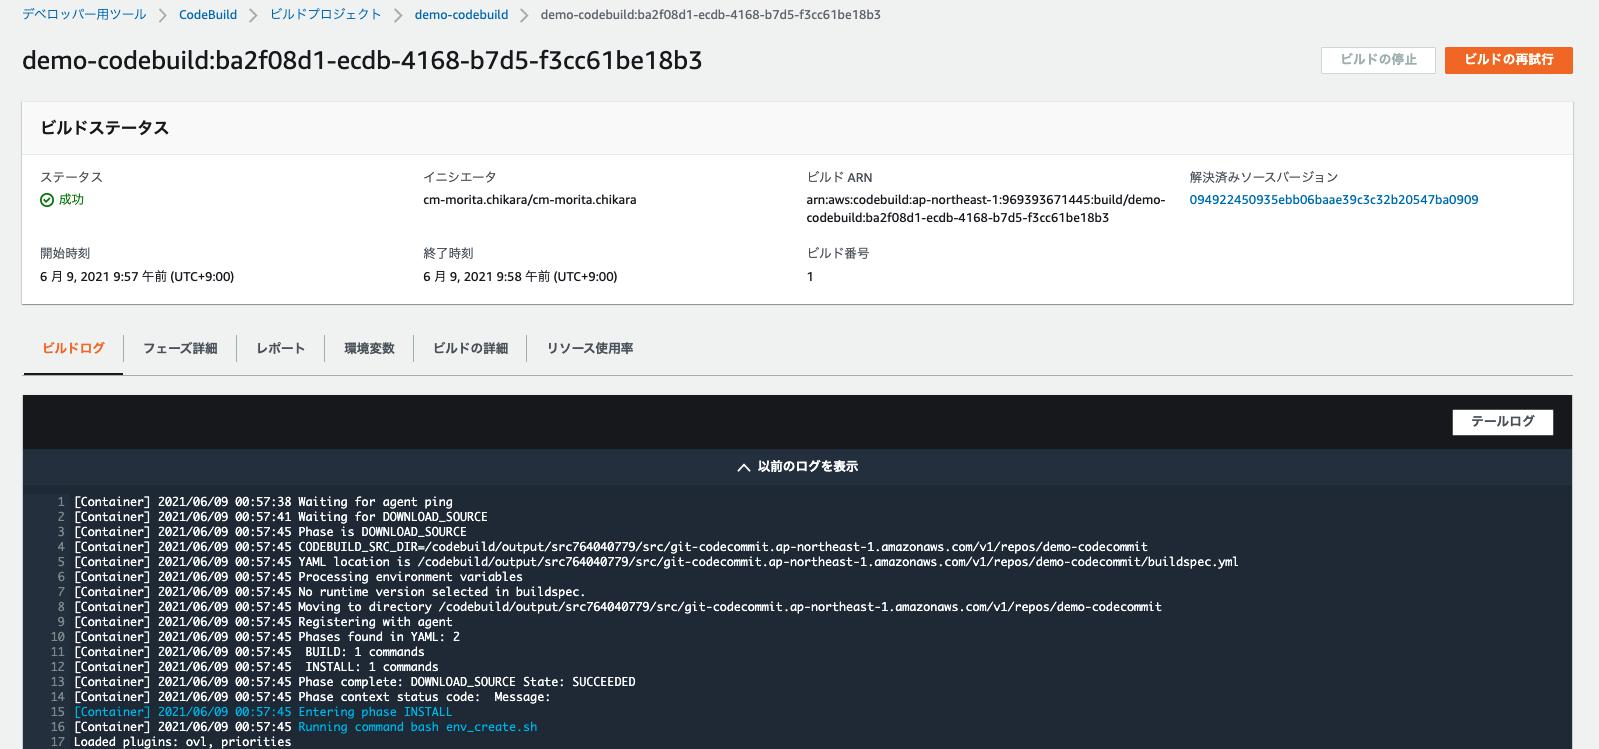 https://cdn-ssl-devio-img.classmethod.jp/wp-content/uploads/2021/06/2021-06-09_9.59.14.png